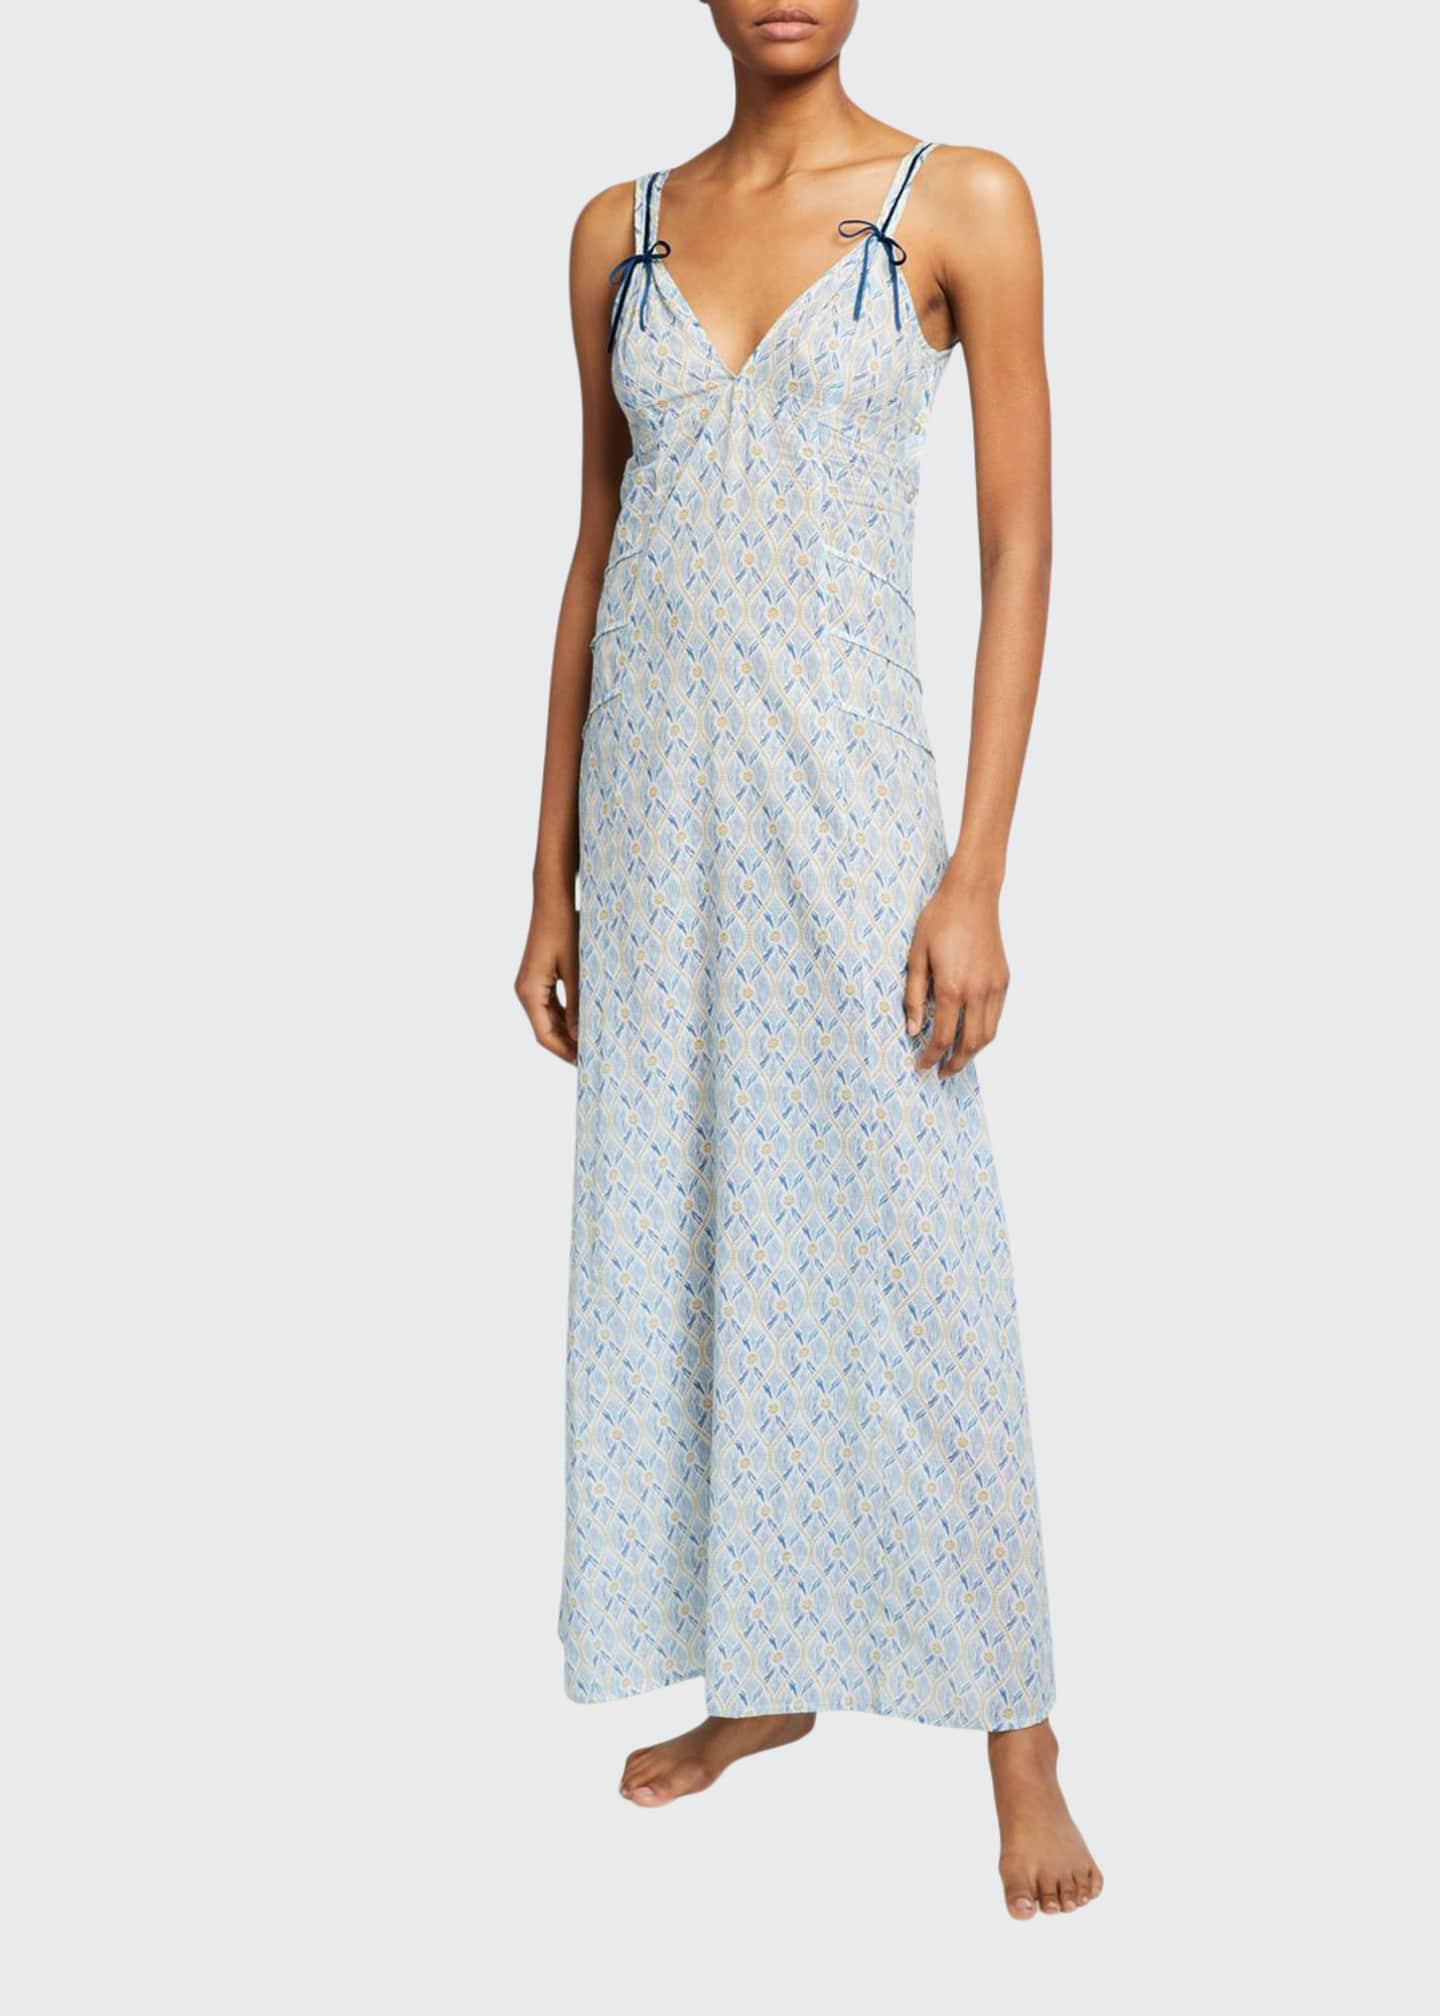 La Costa Del Algodon Hester Graphic-Pattern Long Nightgown